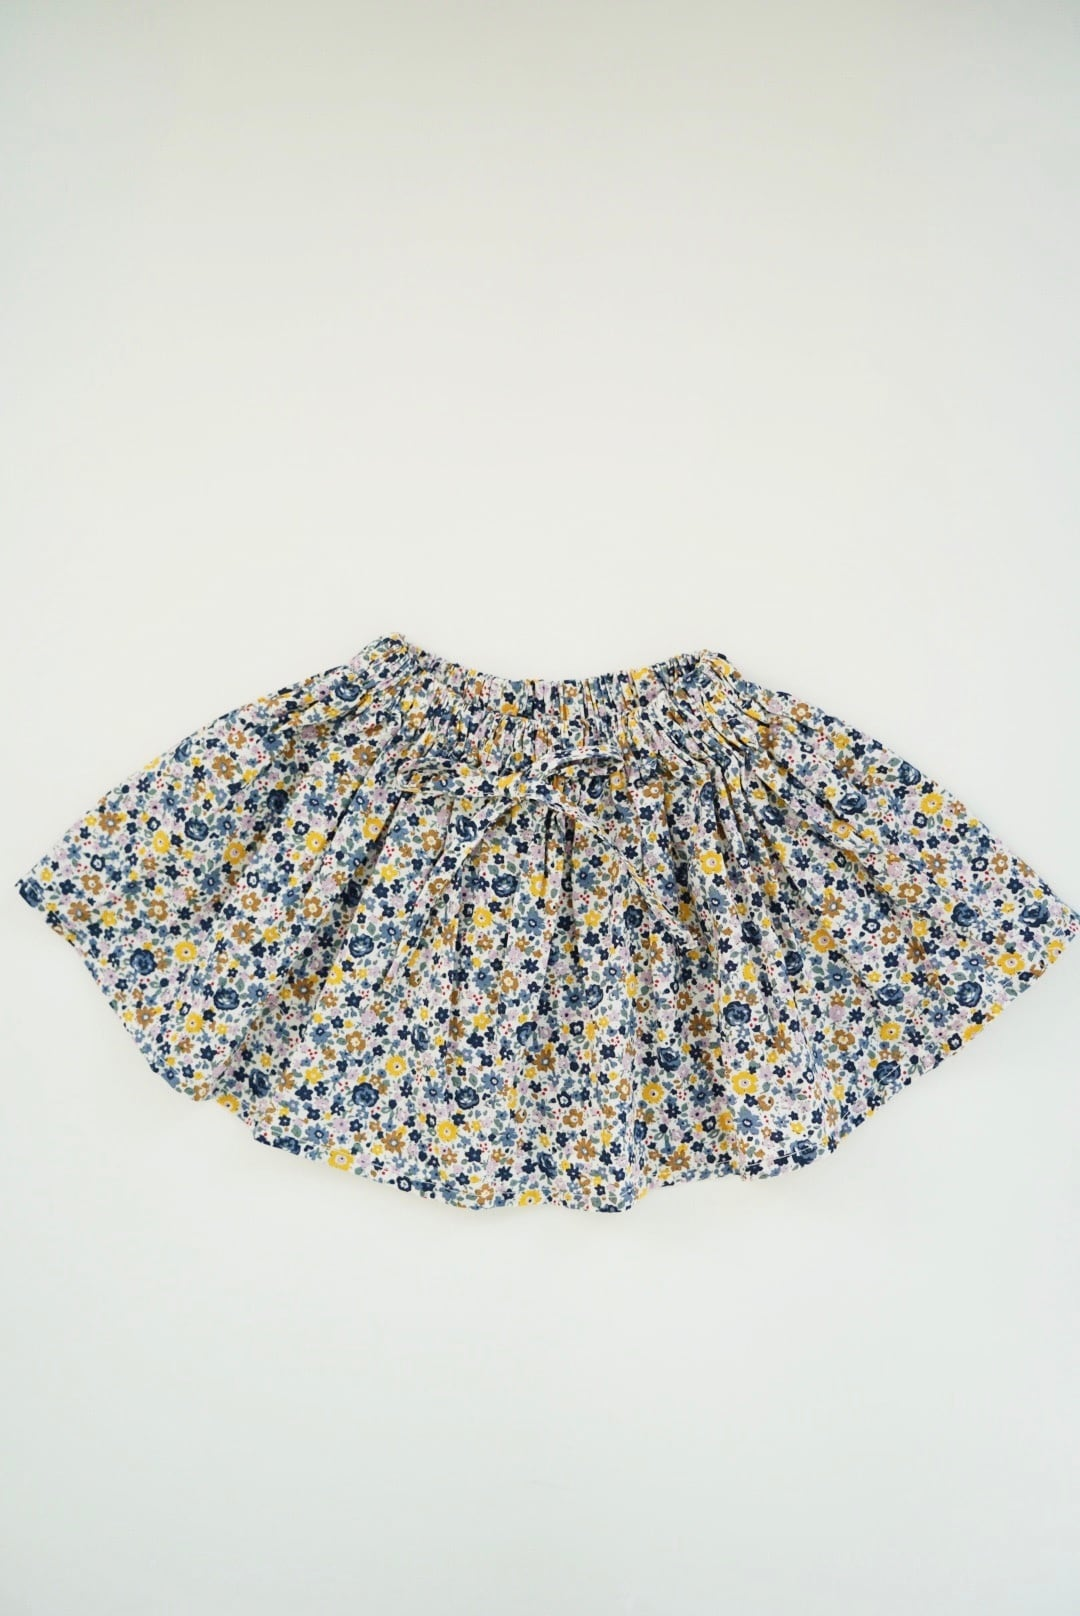 PRECIOUS APRIL / Lillian cotton skirt